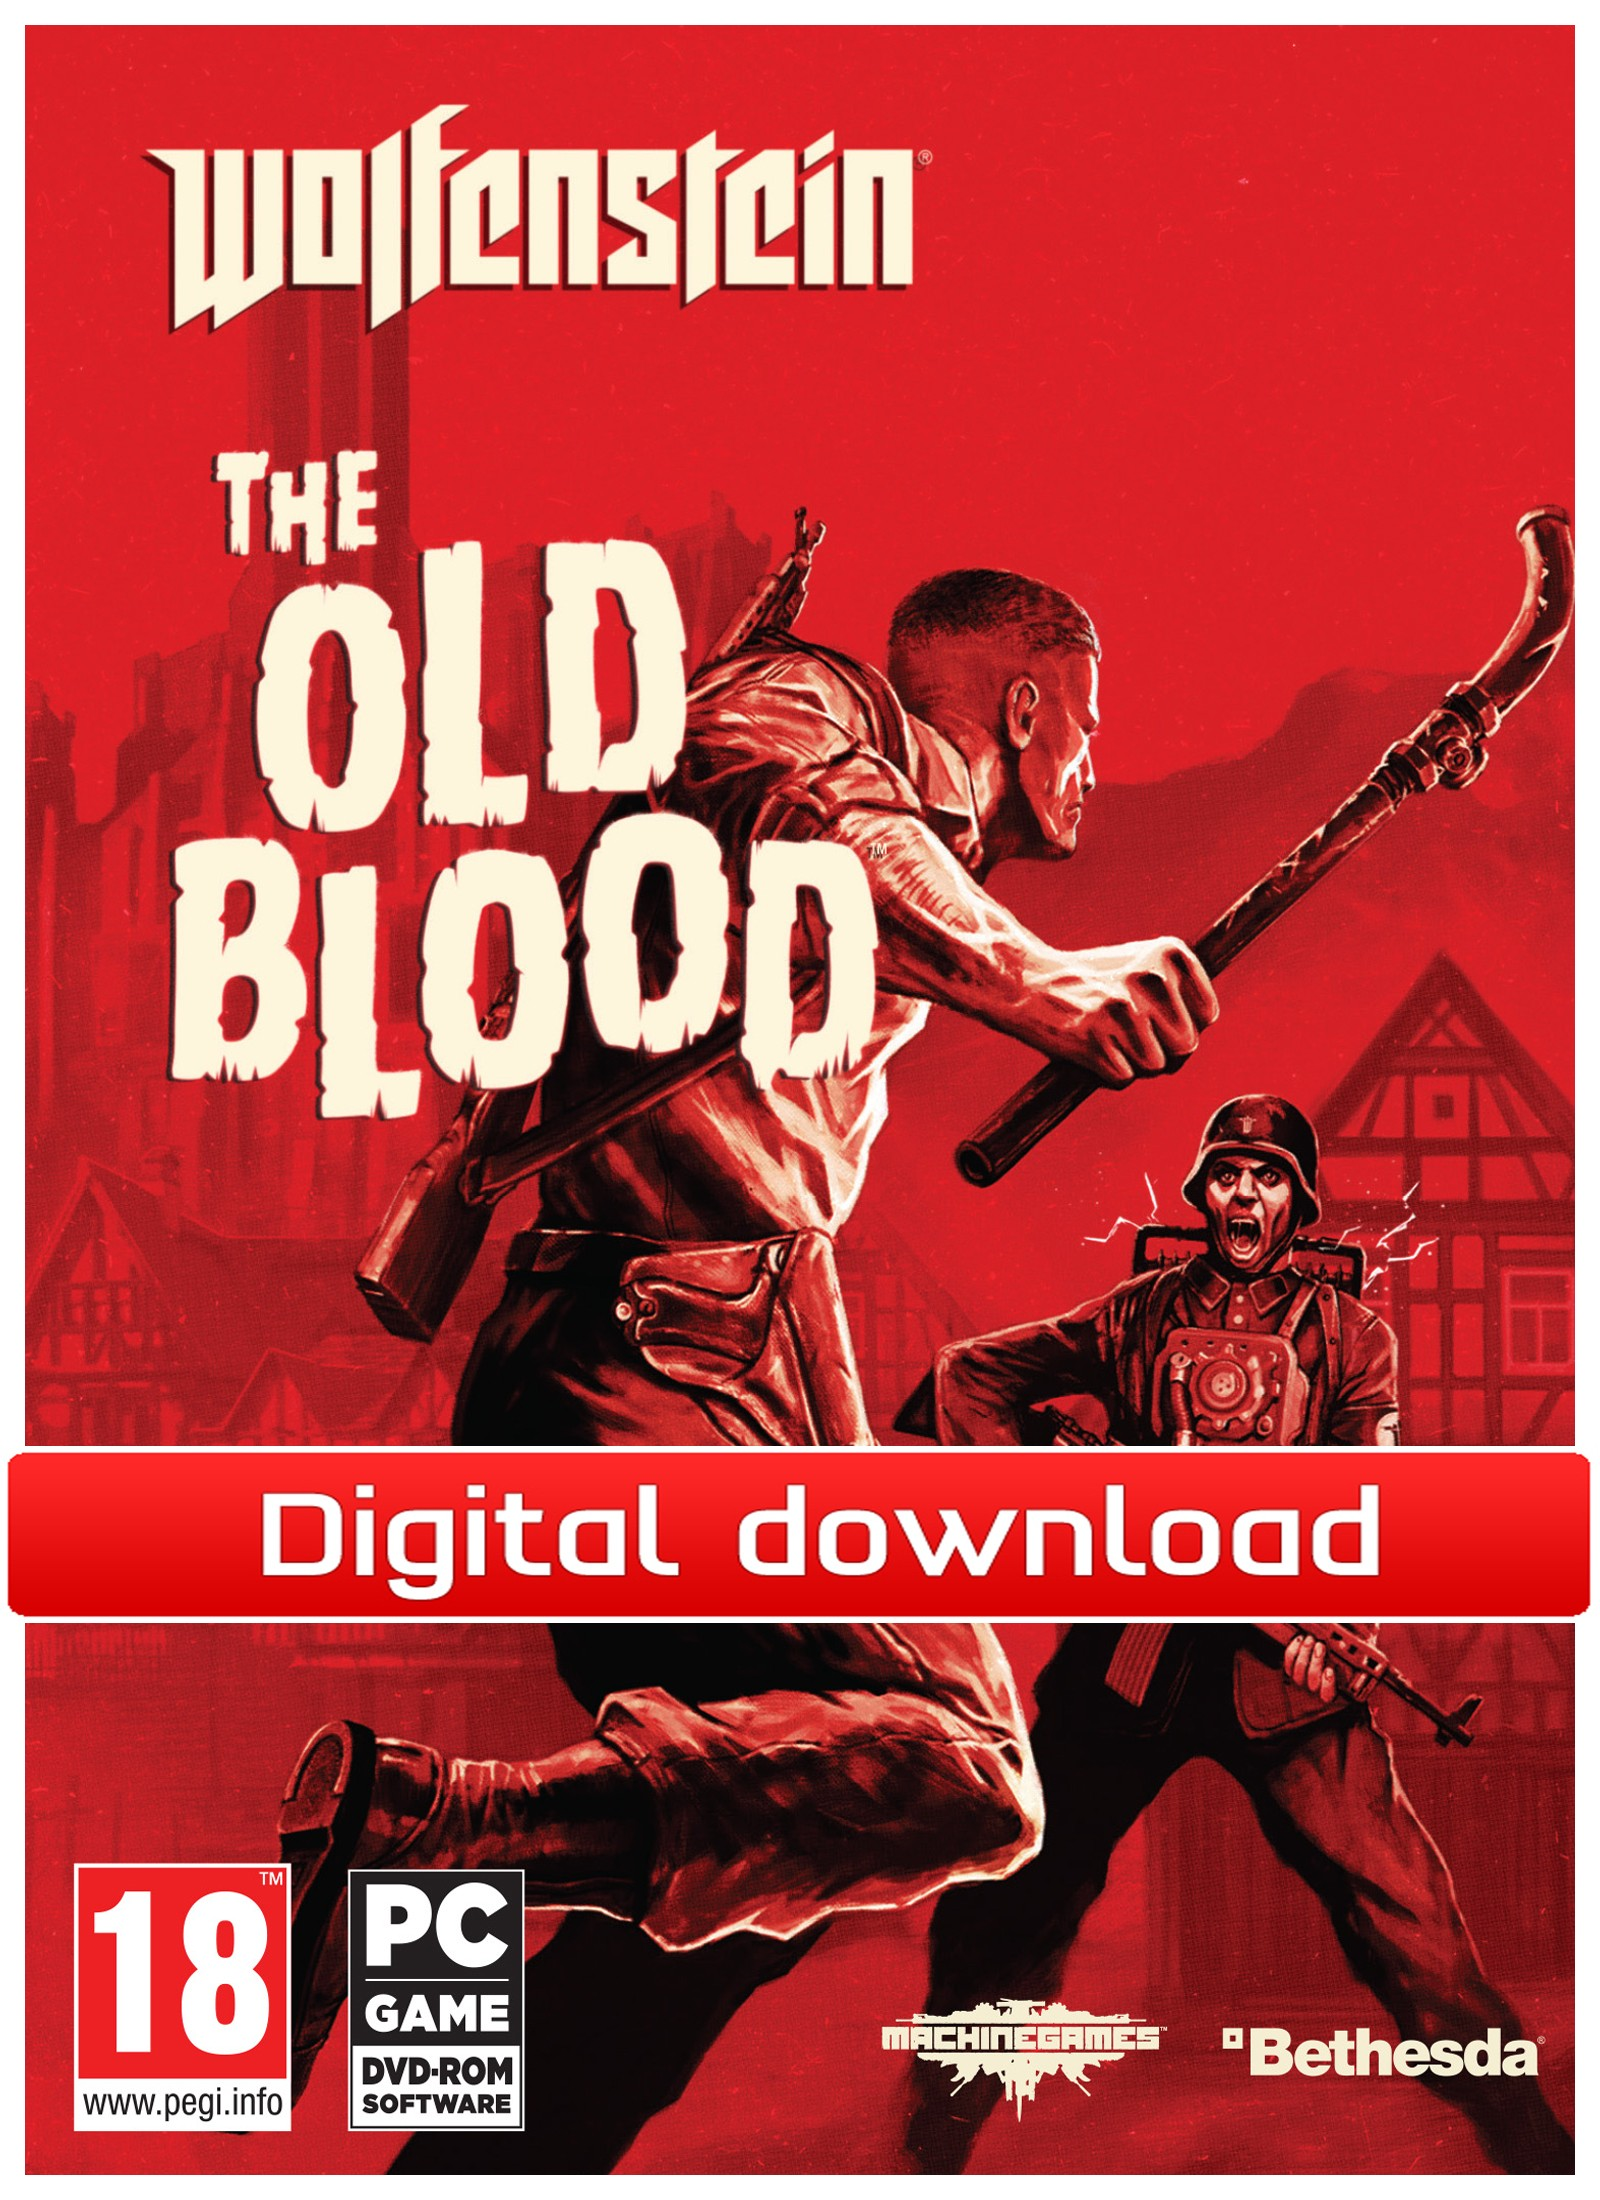 Wolfenstein: The Old Blood (PC nedlastning) PCDD37012